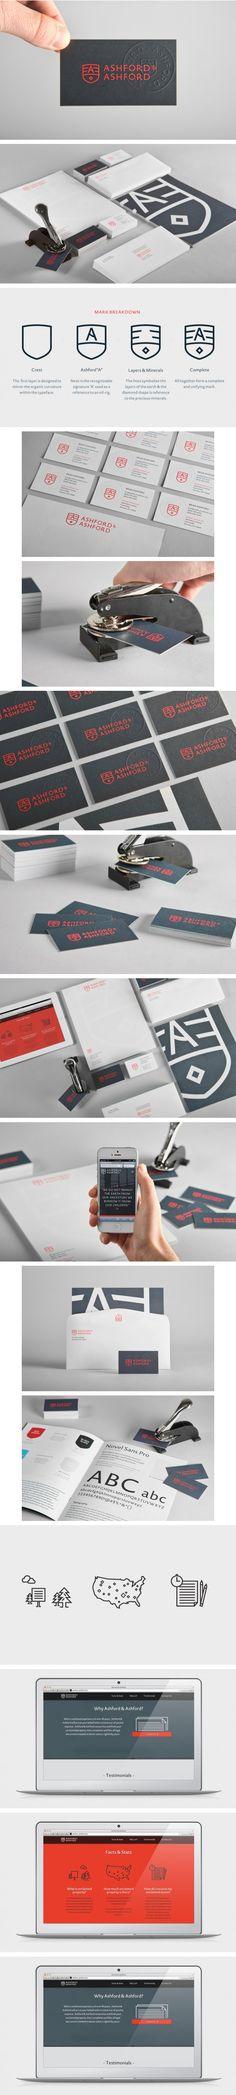 Ashford & Ashford identity | #stationary #corporate #design #corporatedesign #identity #branding #marketing < repinned by www.BlickeDeeler.de | Take a look at www.LogoGestaltung-Hamburg.de